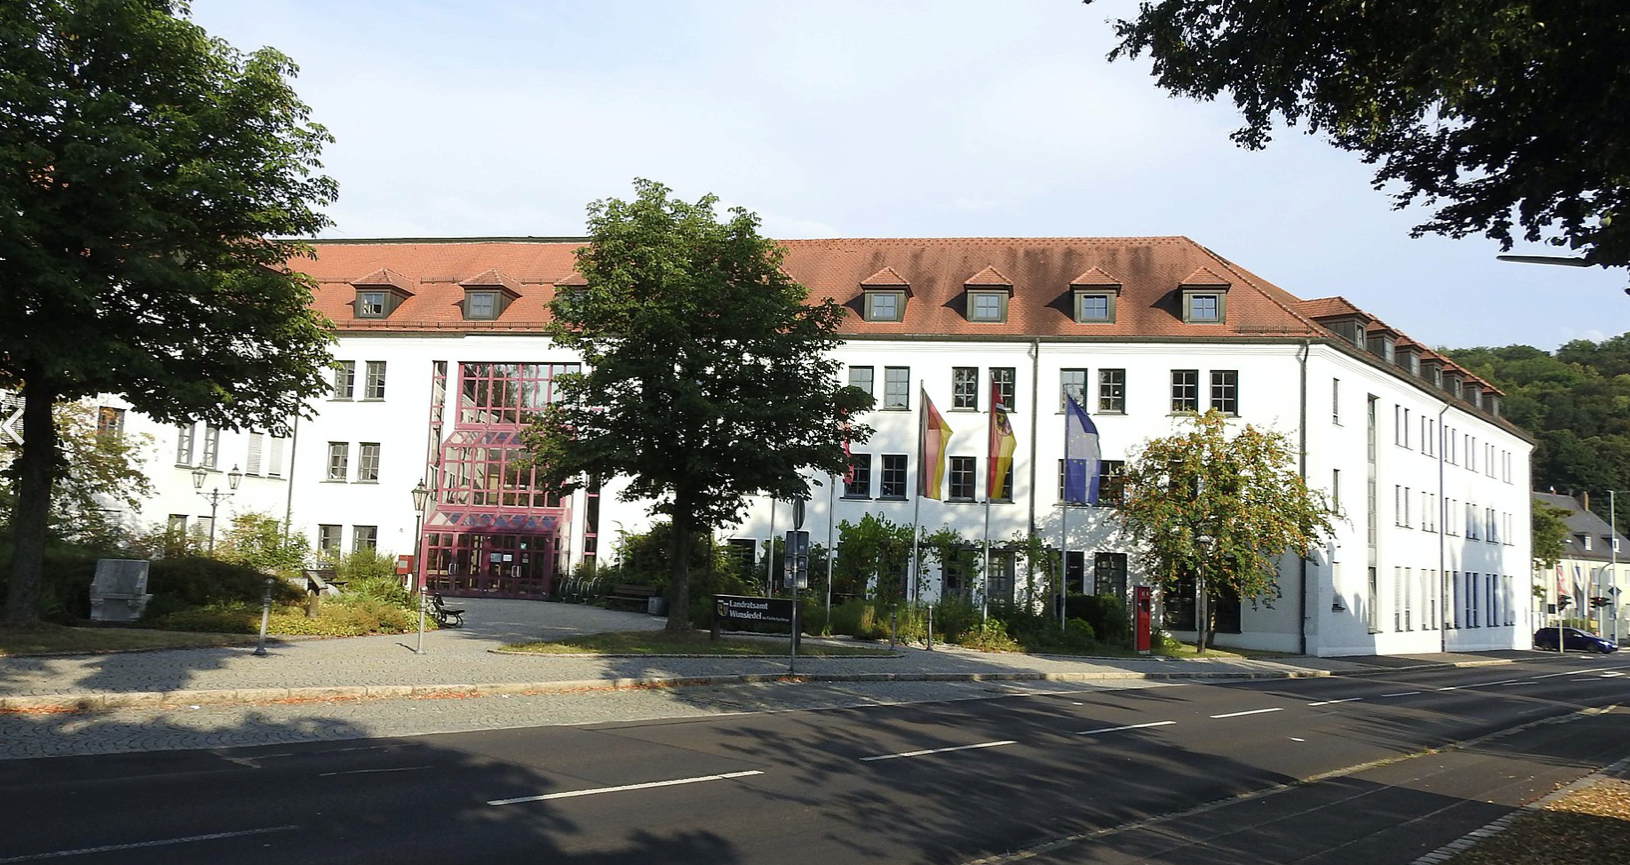 Das Landratsamt in Wunsiedel will das Heimatgefühl der Bürger stärken